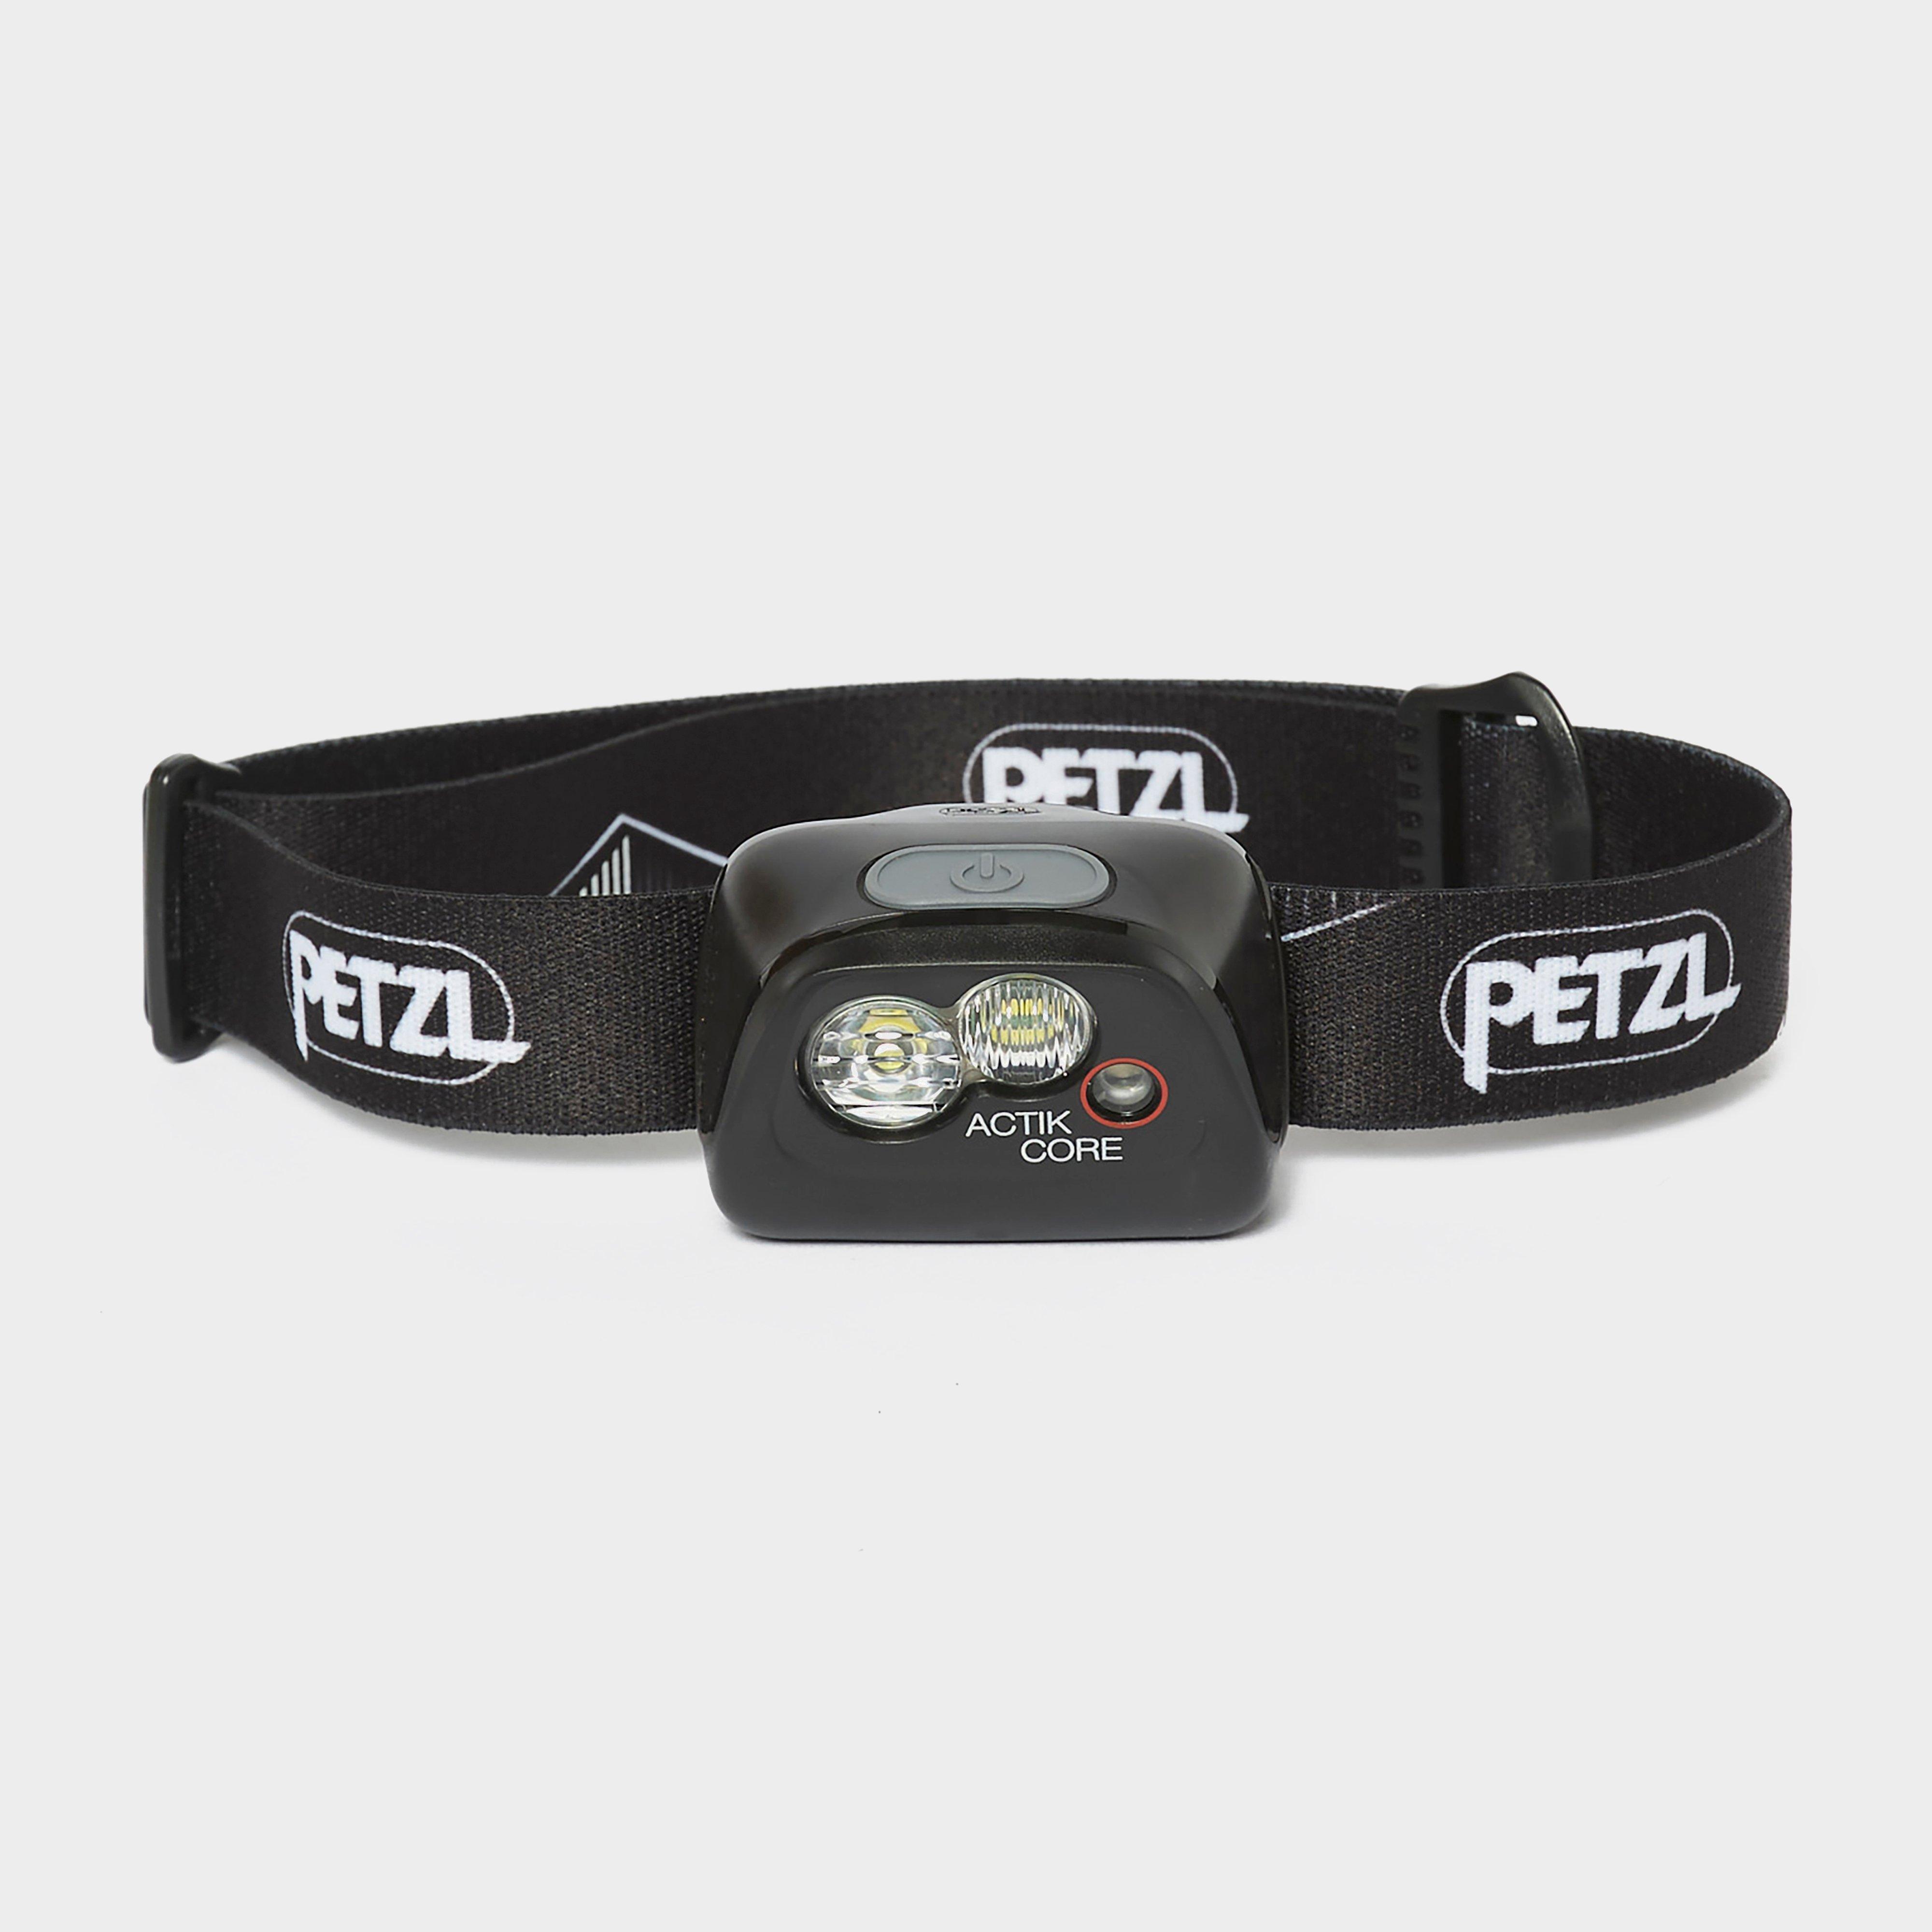 Petzl Petzl Actik CORE Headtorch - Black, Black